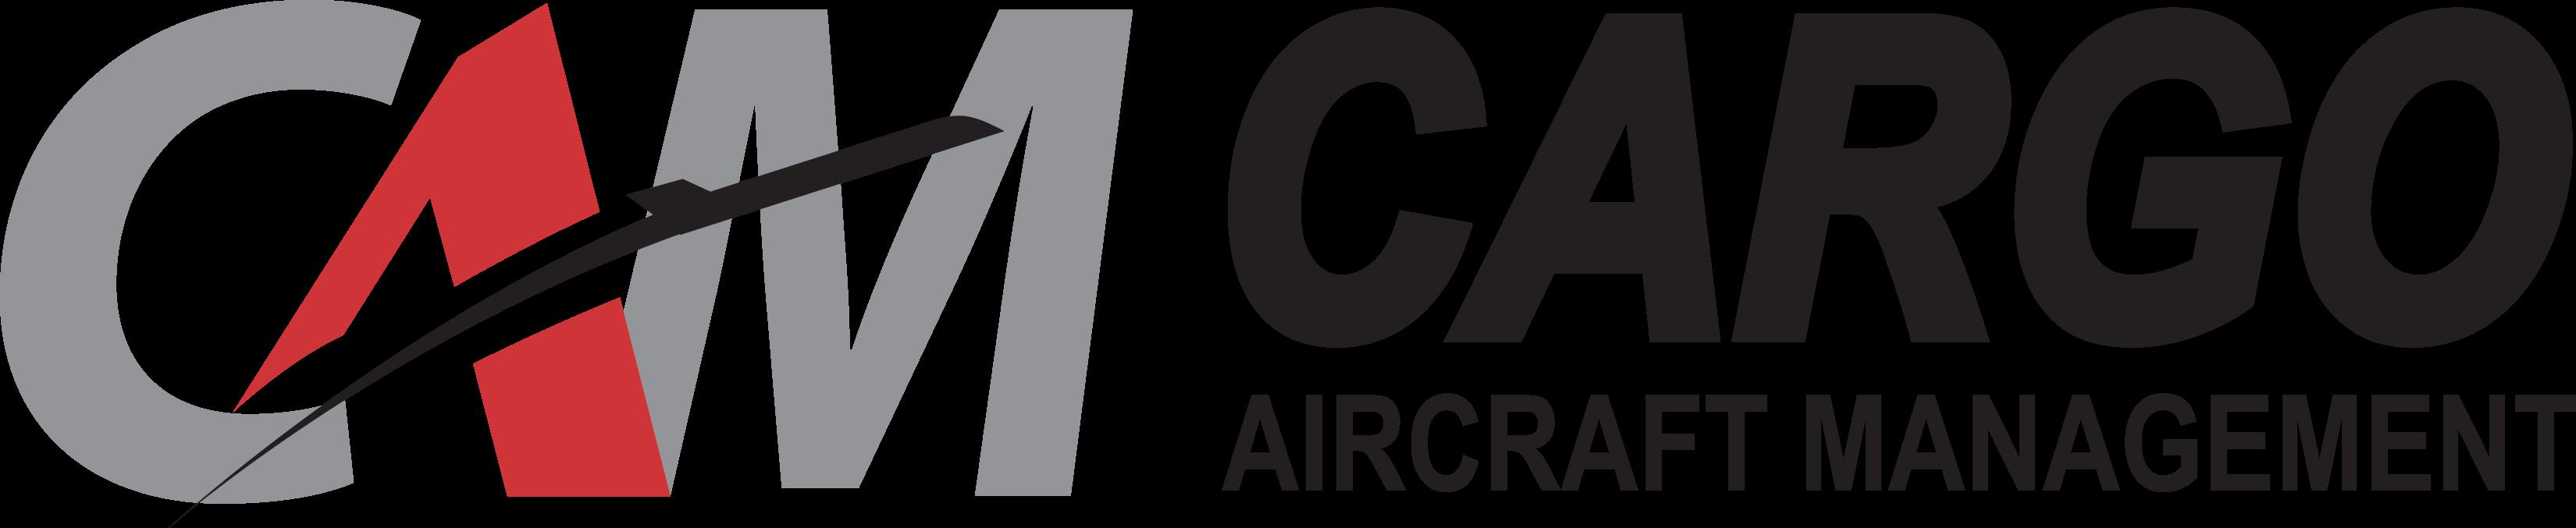 Cargo Aircraft Management Logo